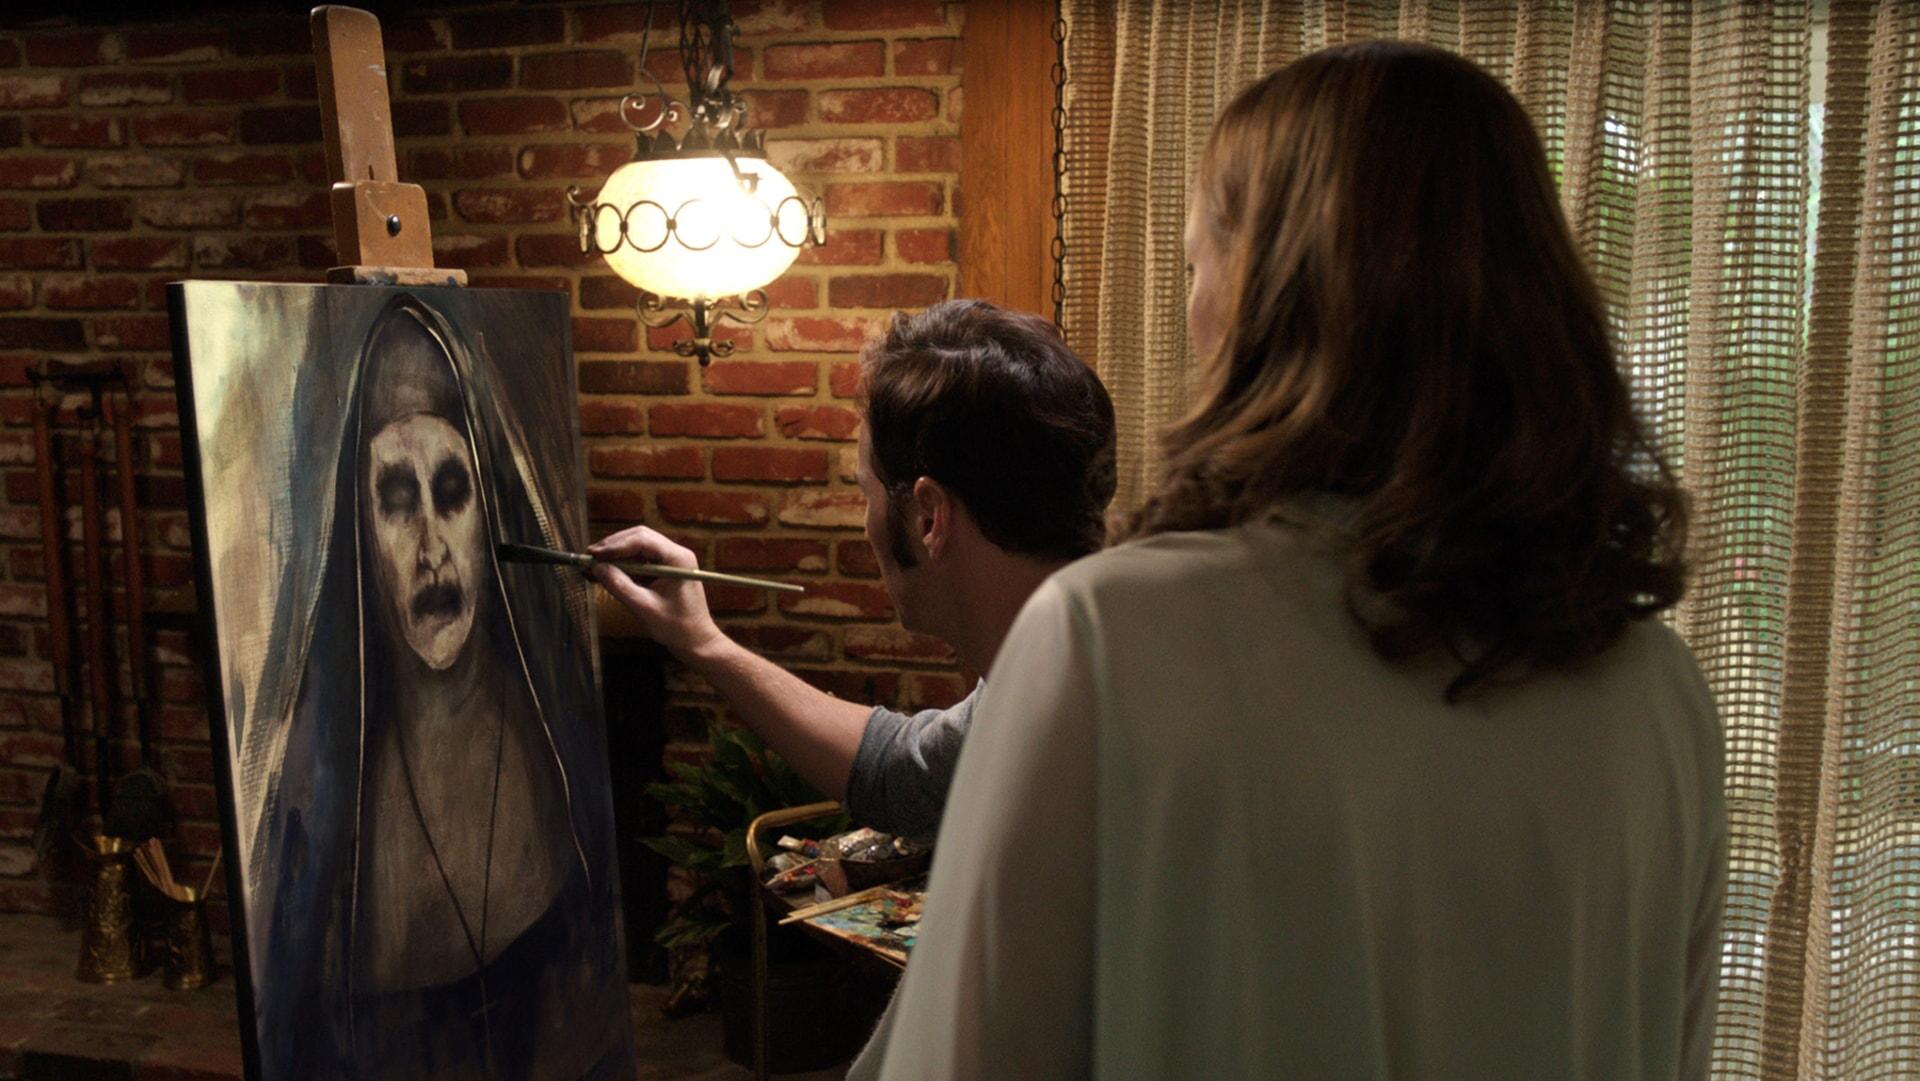 PATRICK WILSON as Ed Warren painting a portrait of a ghostly nun while VERA FARMIGA as Lorraine Warren looks on behind him